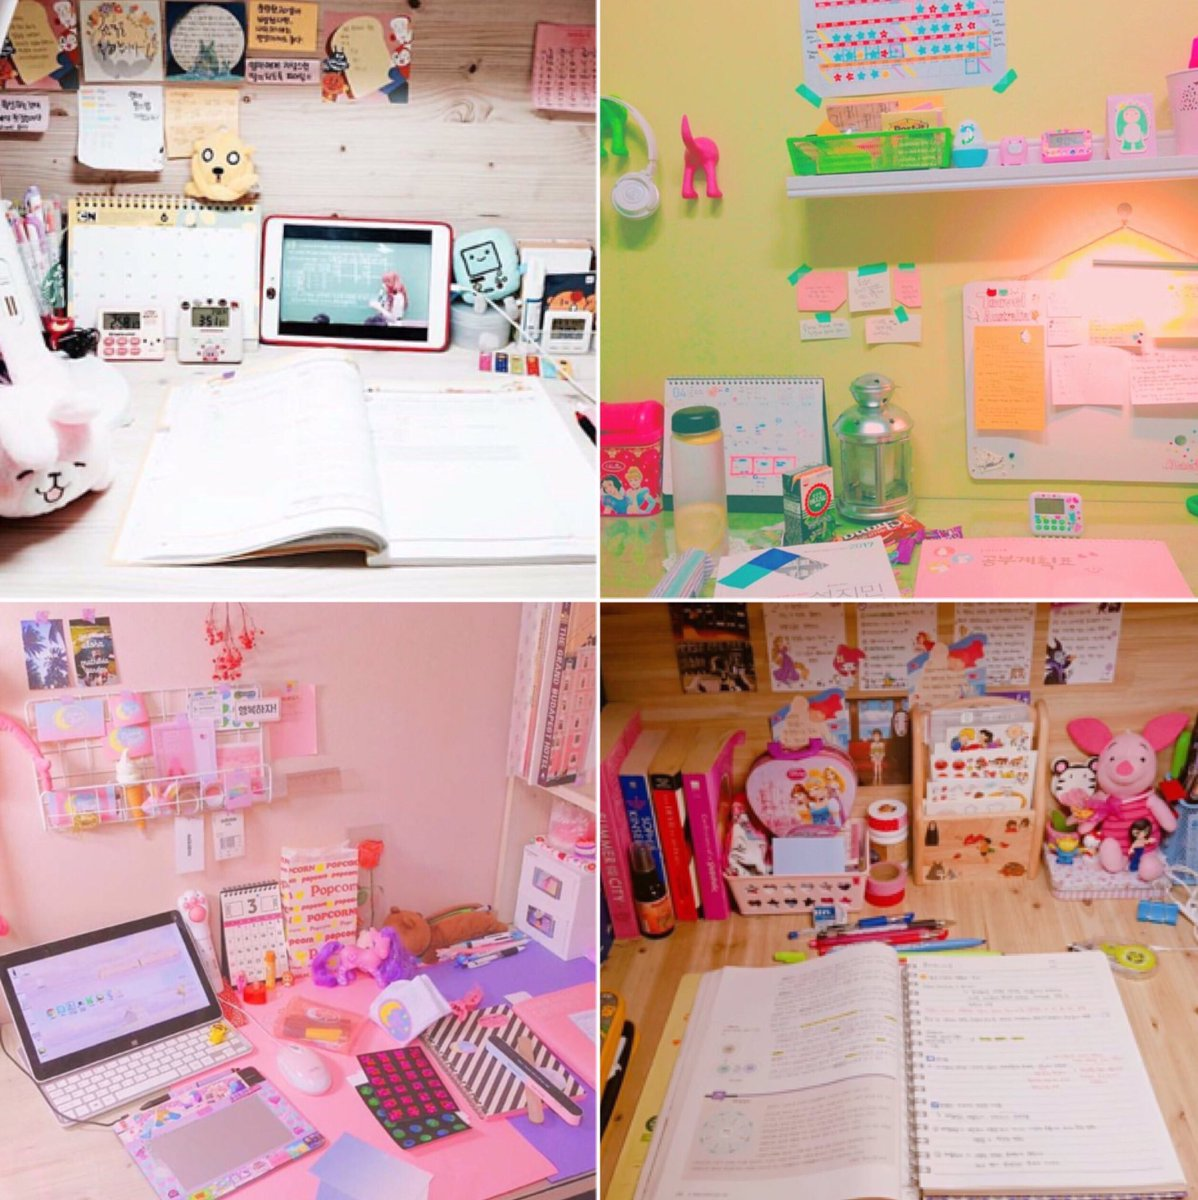 Ikea Childrens Bedroom Ideas ㅇㅅㅇ Kyo0000000000 Twitter